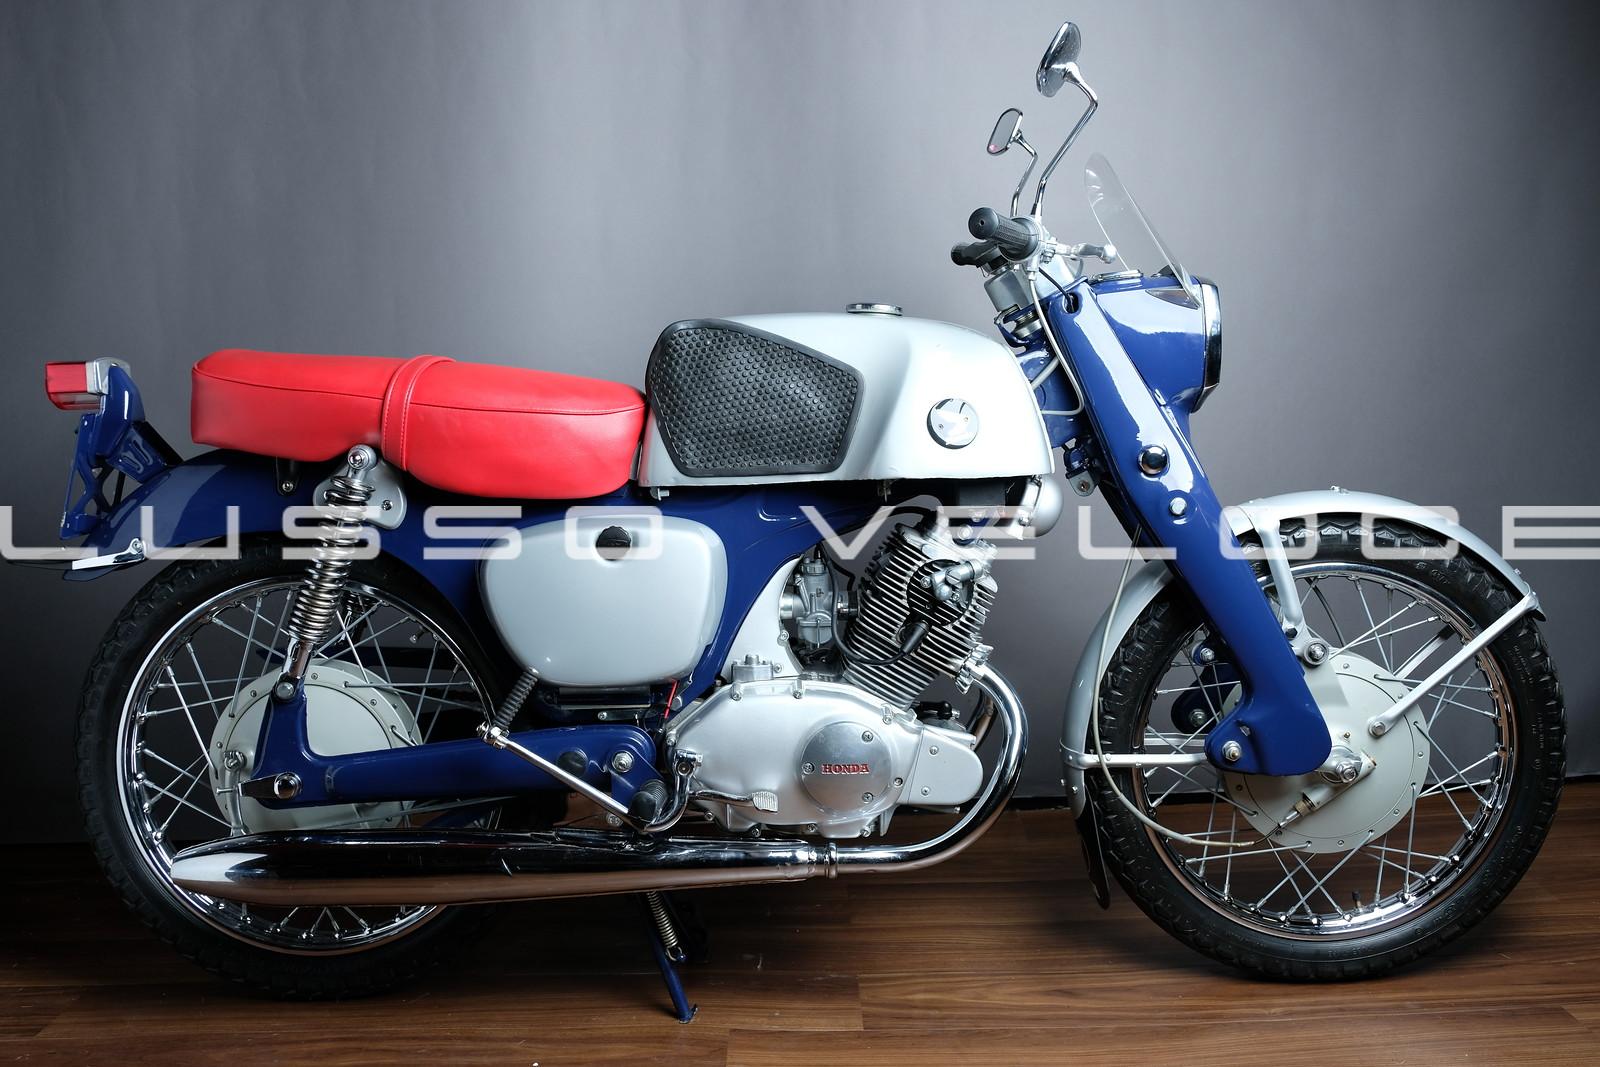 Honda CB92 Benly OHC 125